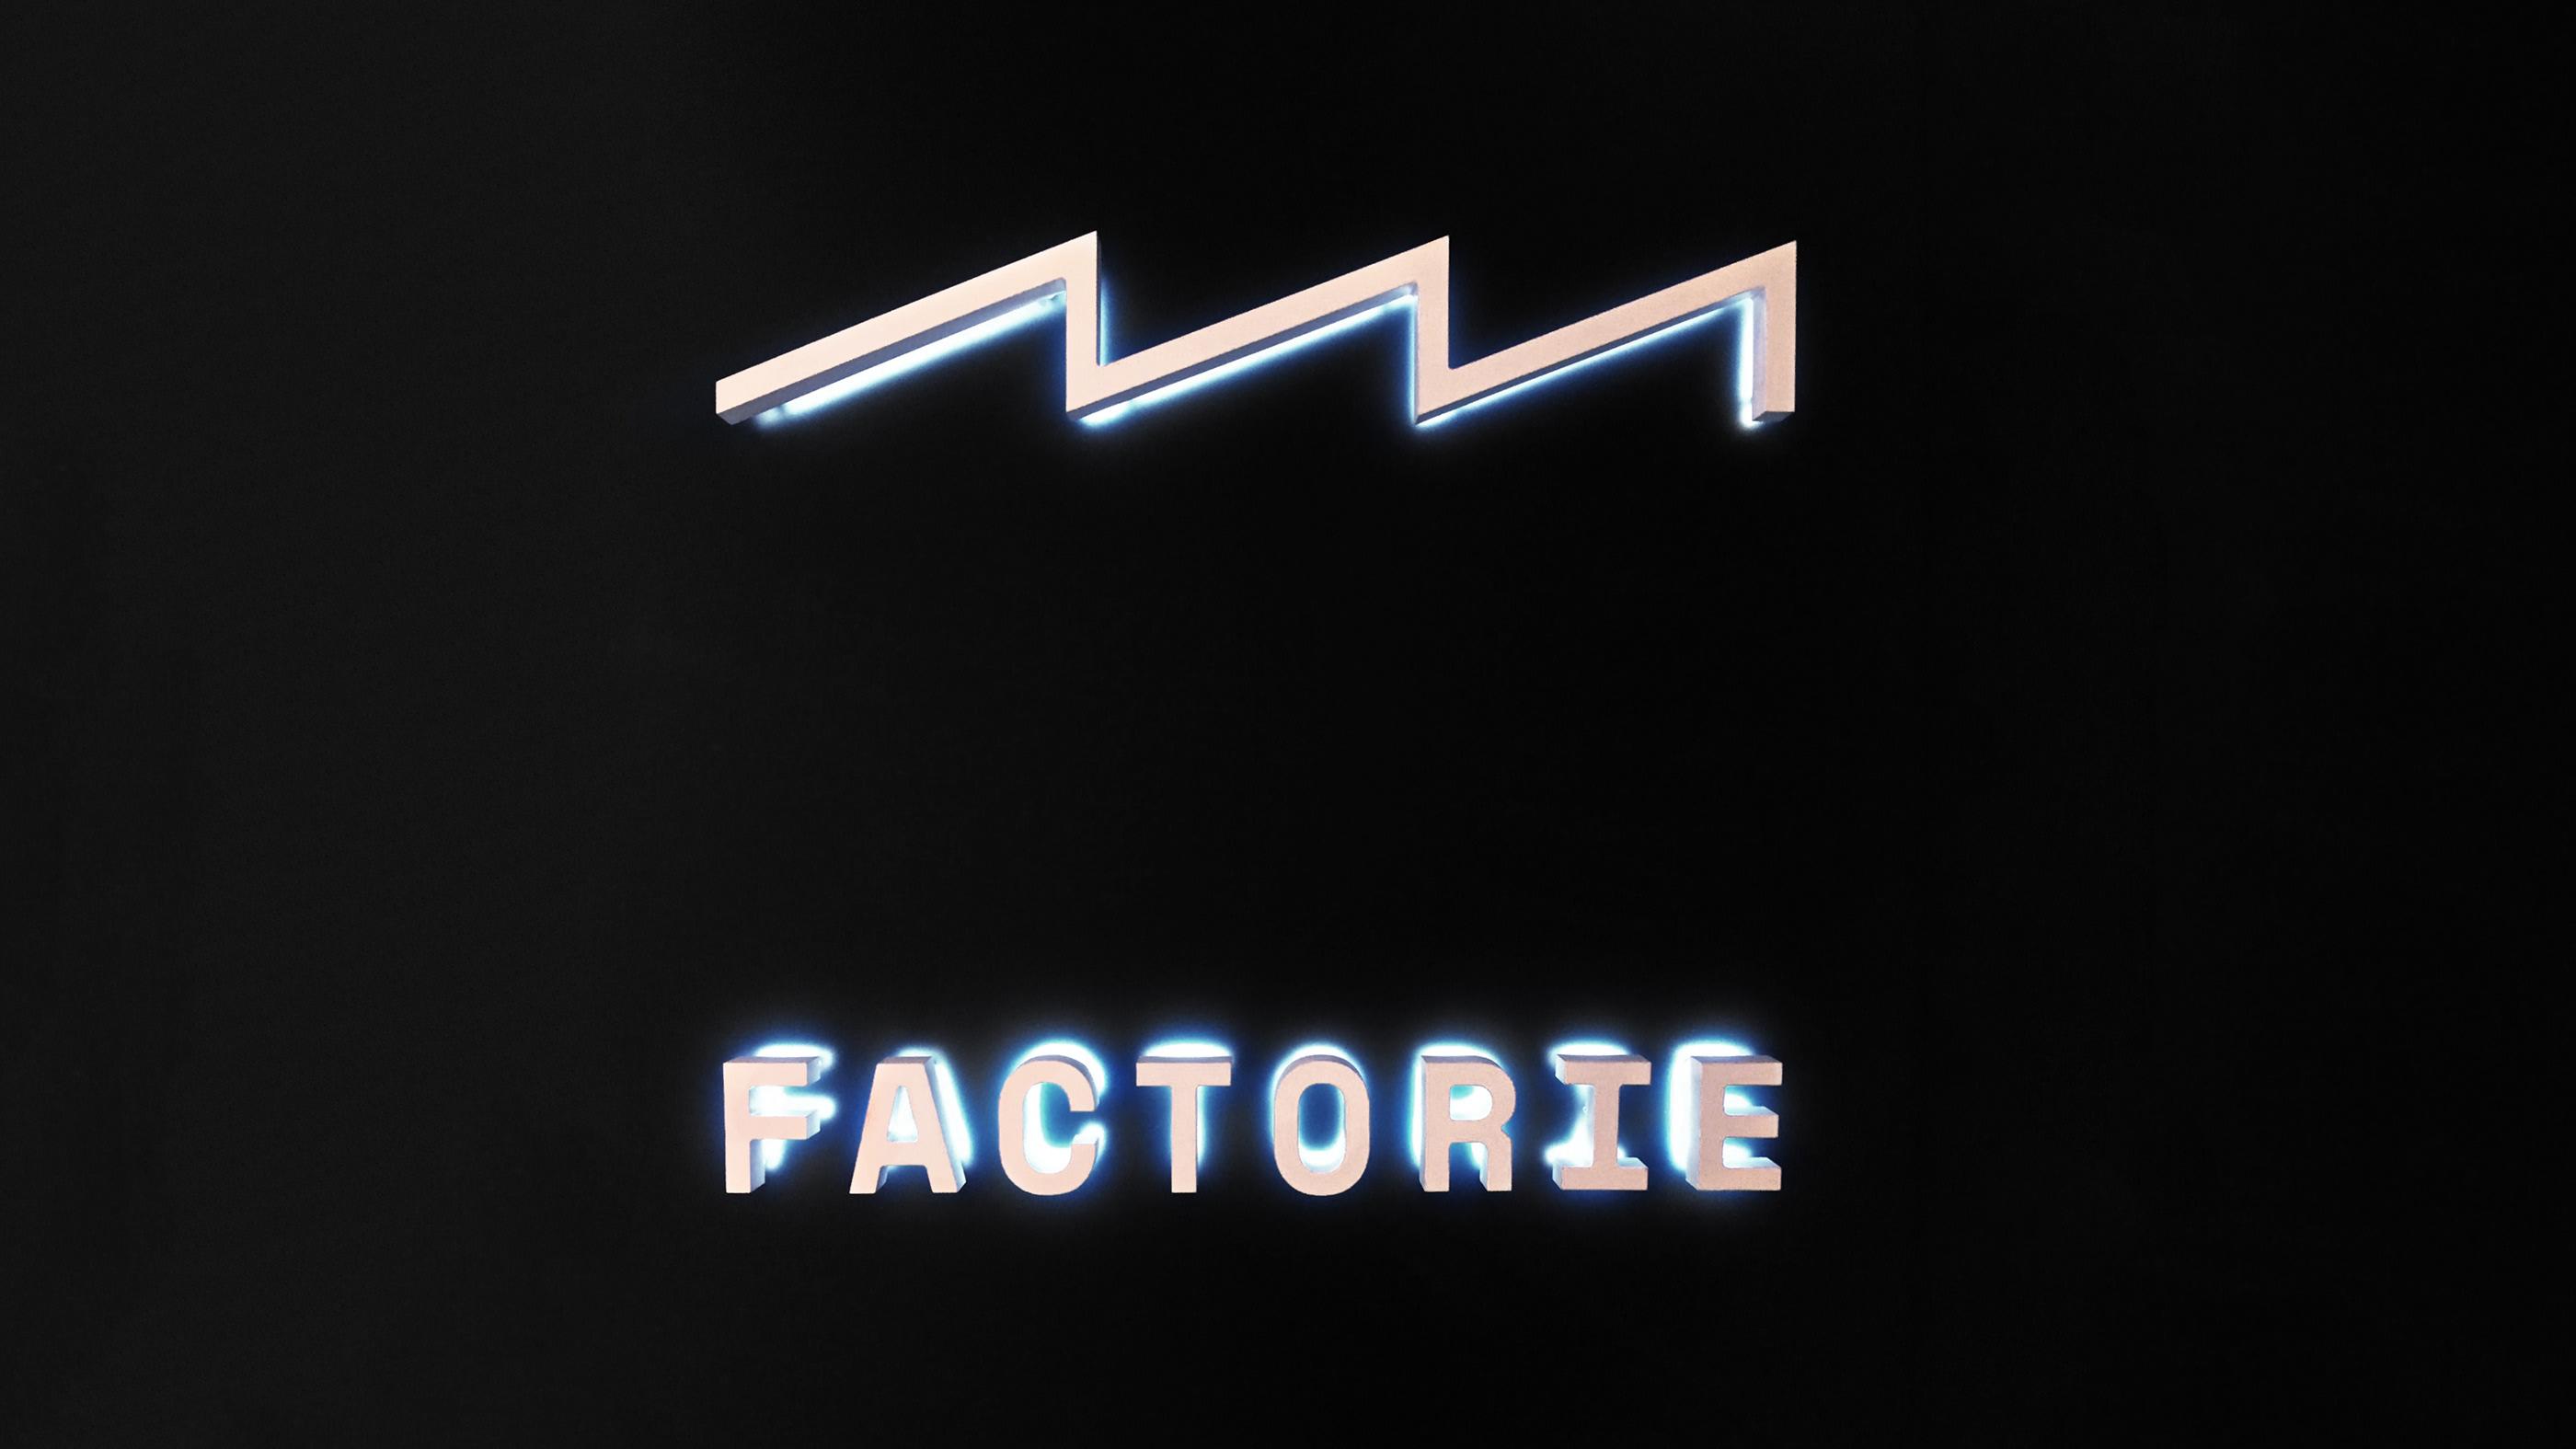 81501071674 Factorie on Behance